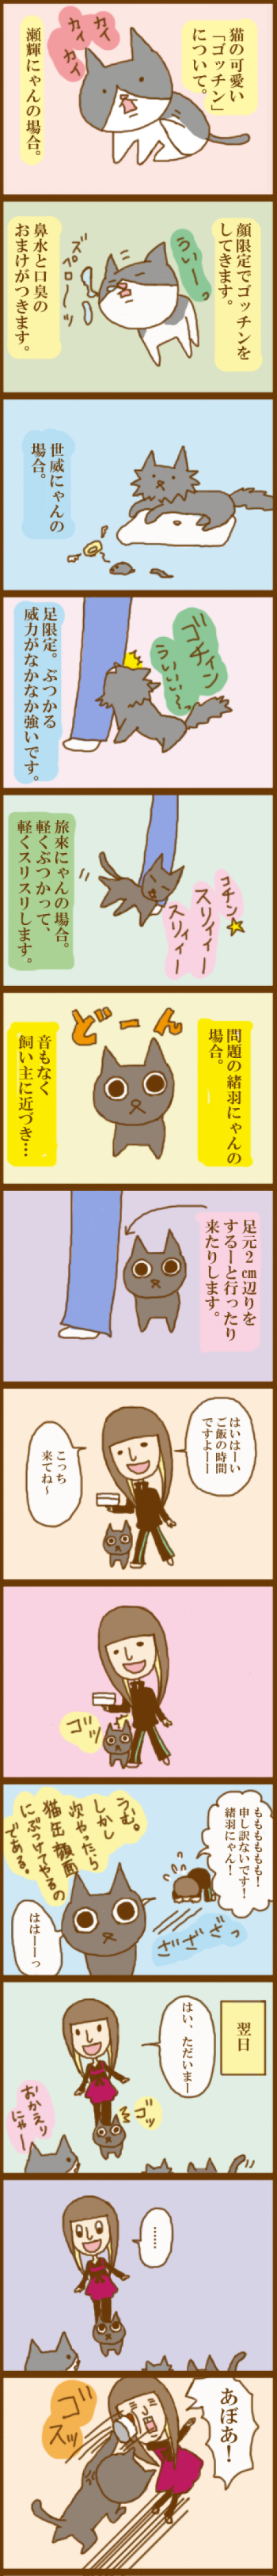 f:id:suzuokayu:20201109092427j:plain